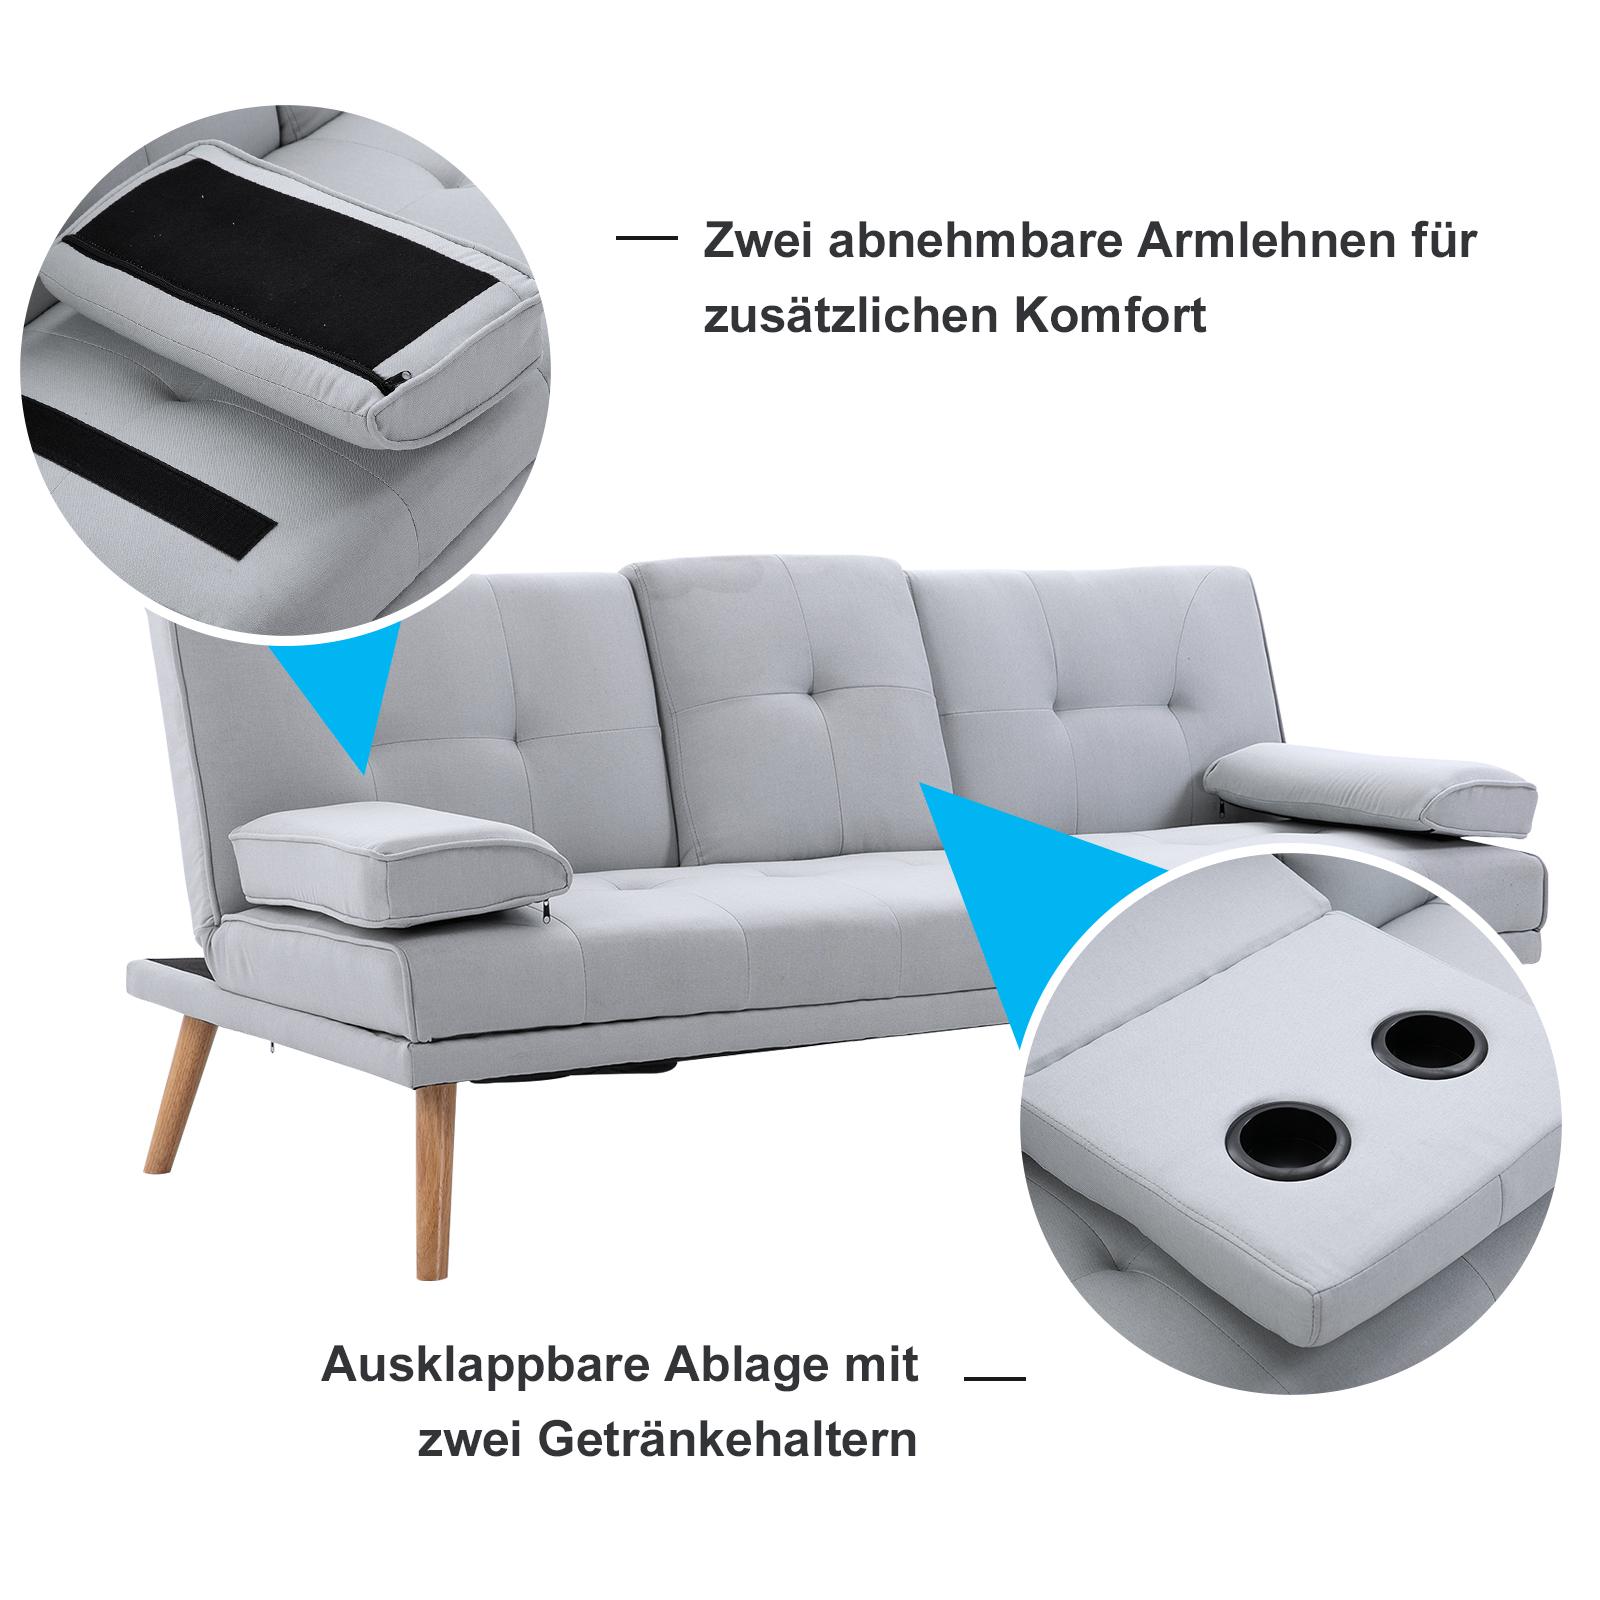 HOMCOM Schlafsofa Sofabett Schlafcouch 3 Sitzer Leinen Hellgrau 181 x 77 x 72 cm